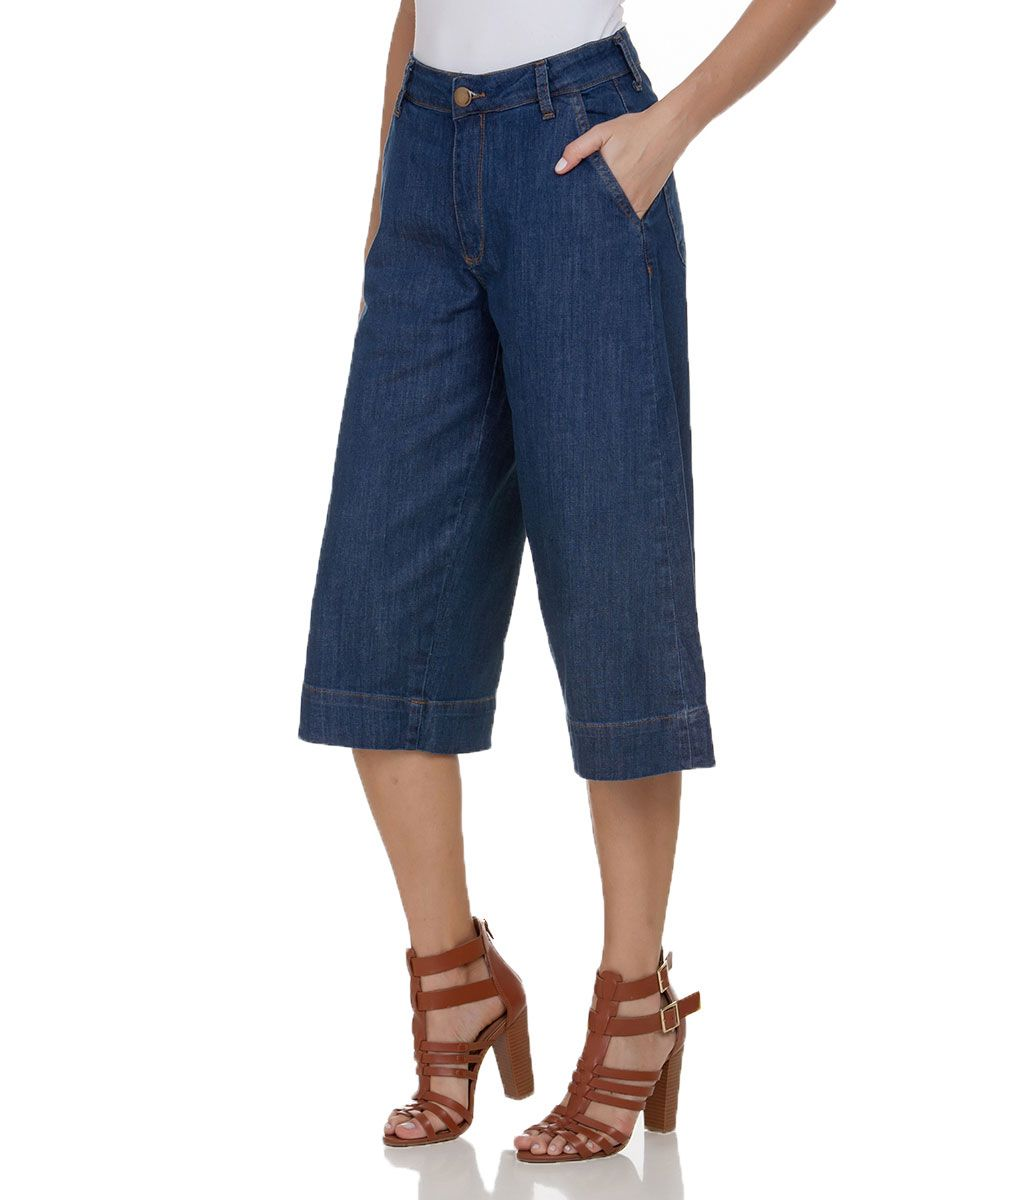 c50ab0b89 Calça Pantacourt Feminina em Jeans - Lojas Renner   ropa casual ...